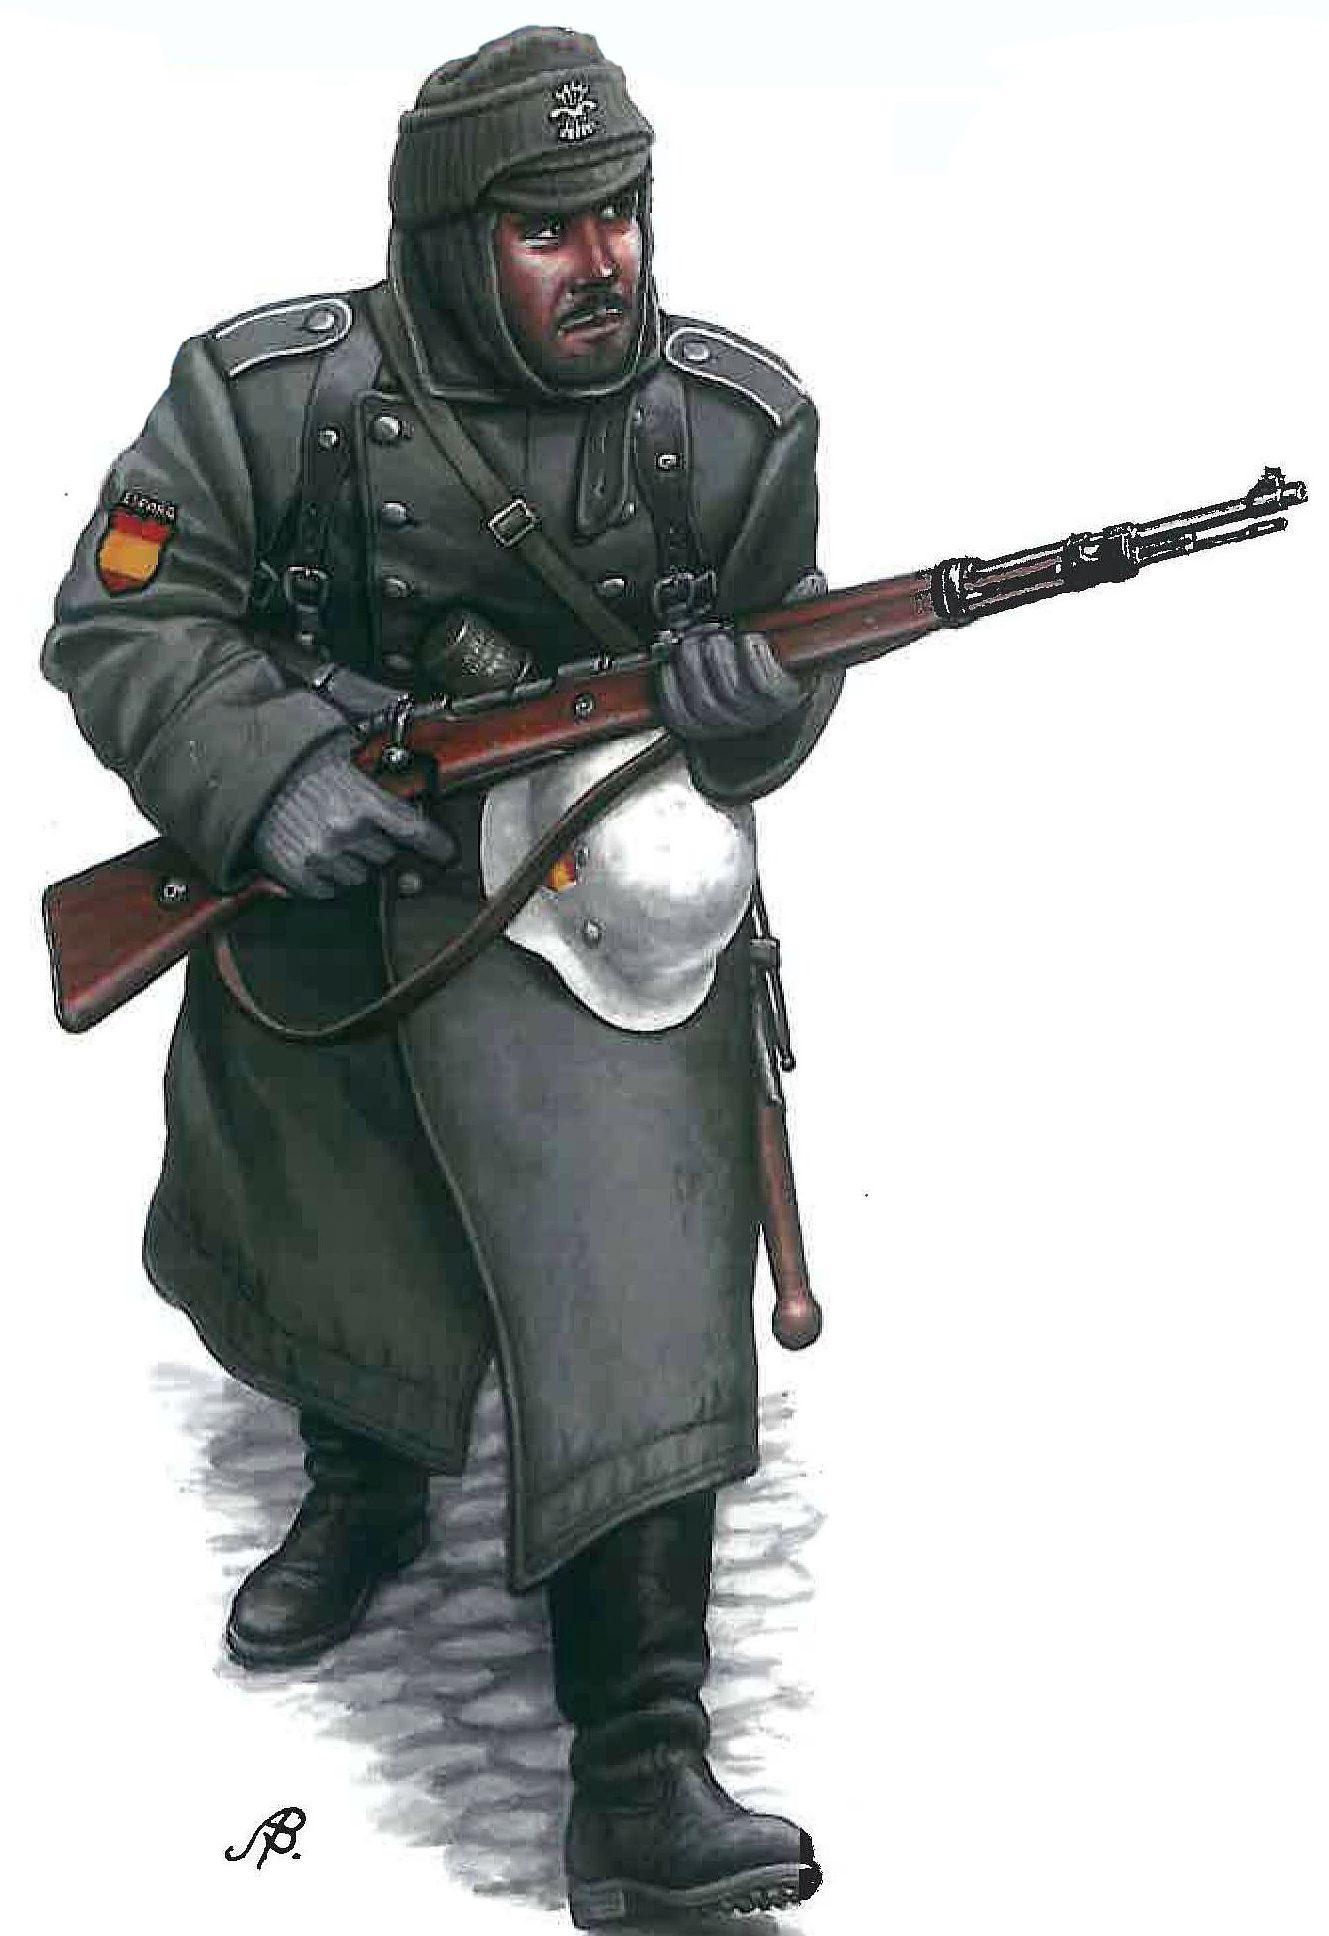 Bulczynki Arnold. Немецкие пехотинцы.